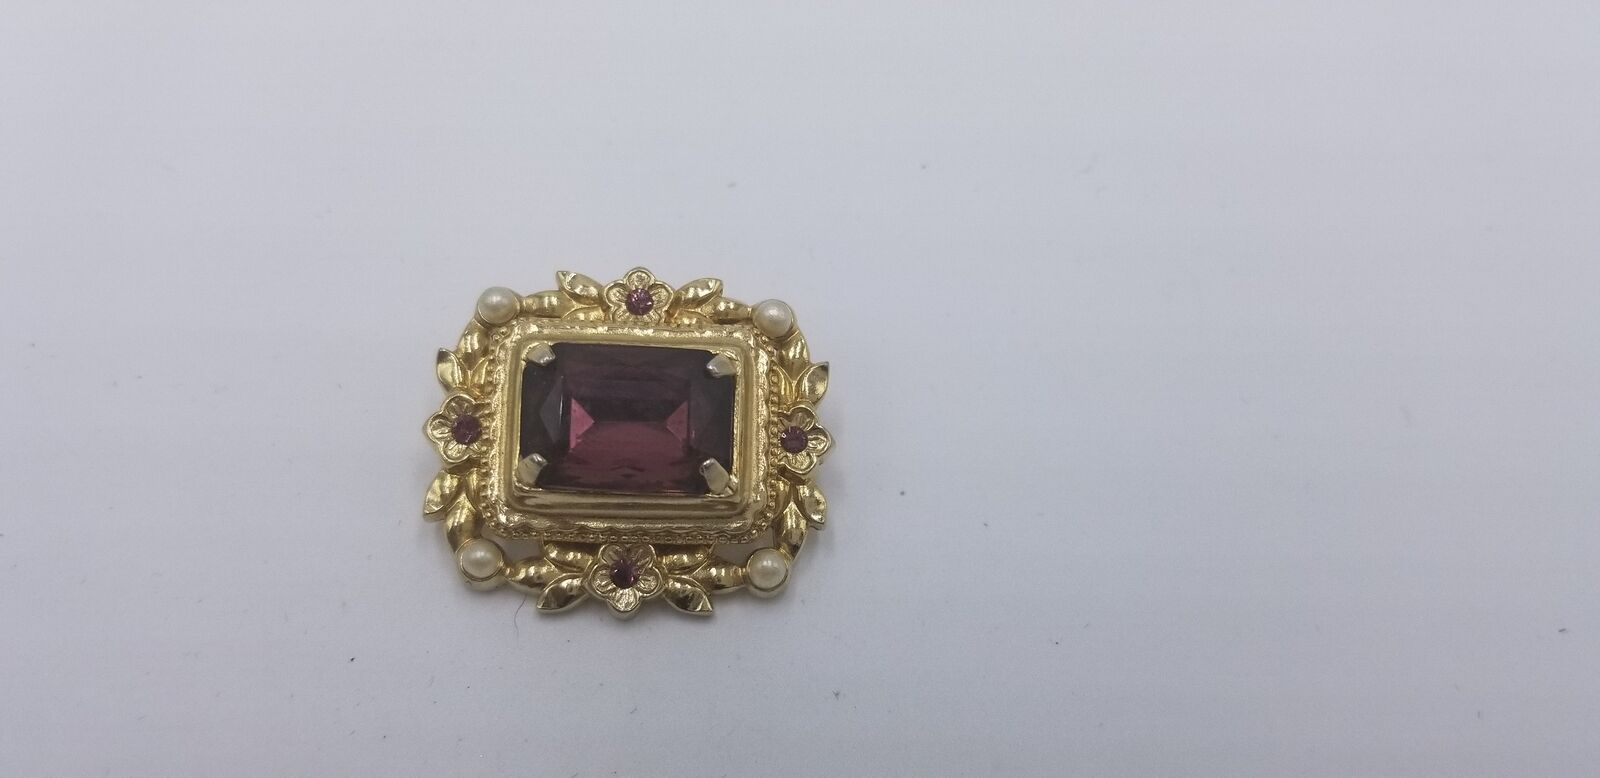 Vintage Signed Coro Gold Tone Pearl & Purple Stone Floral Pin / Brooch EUC